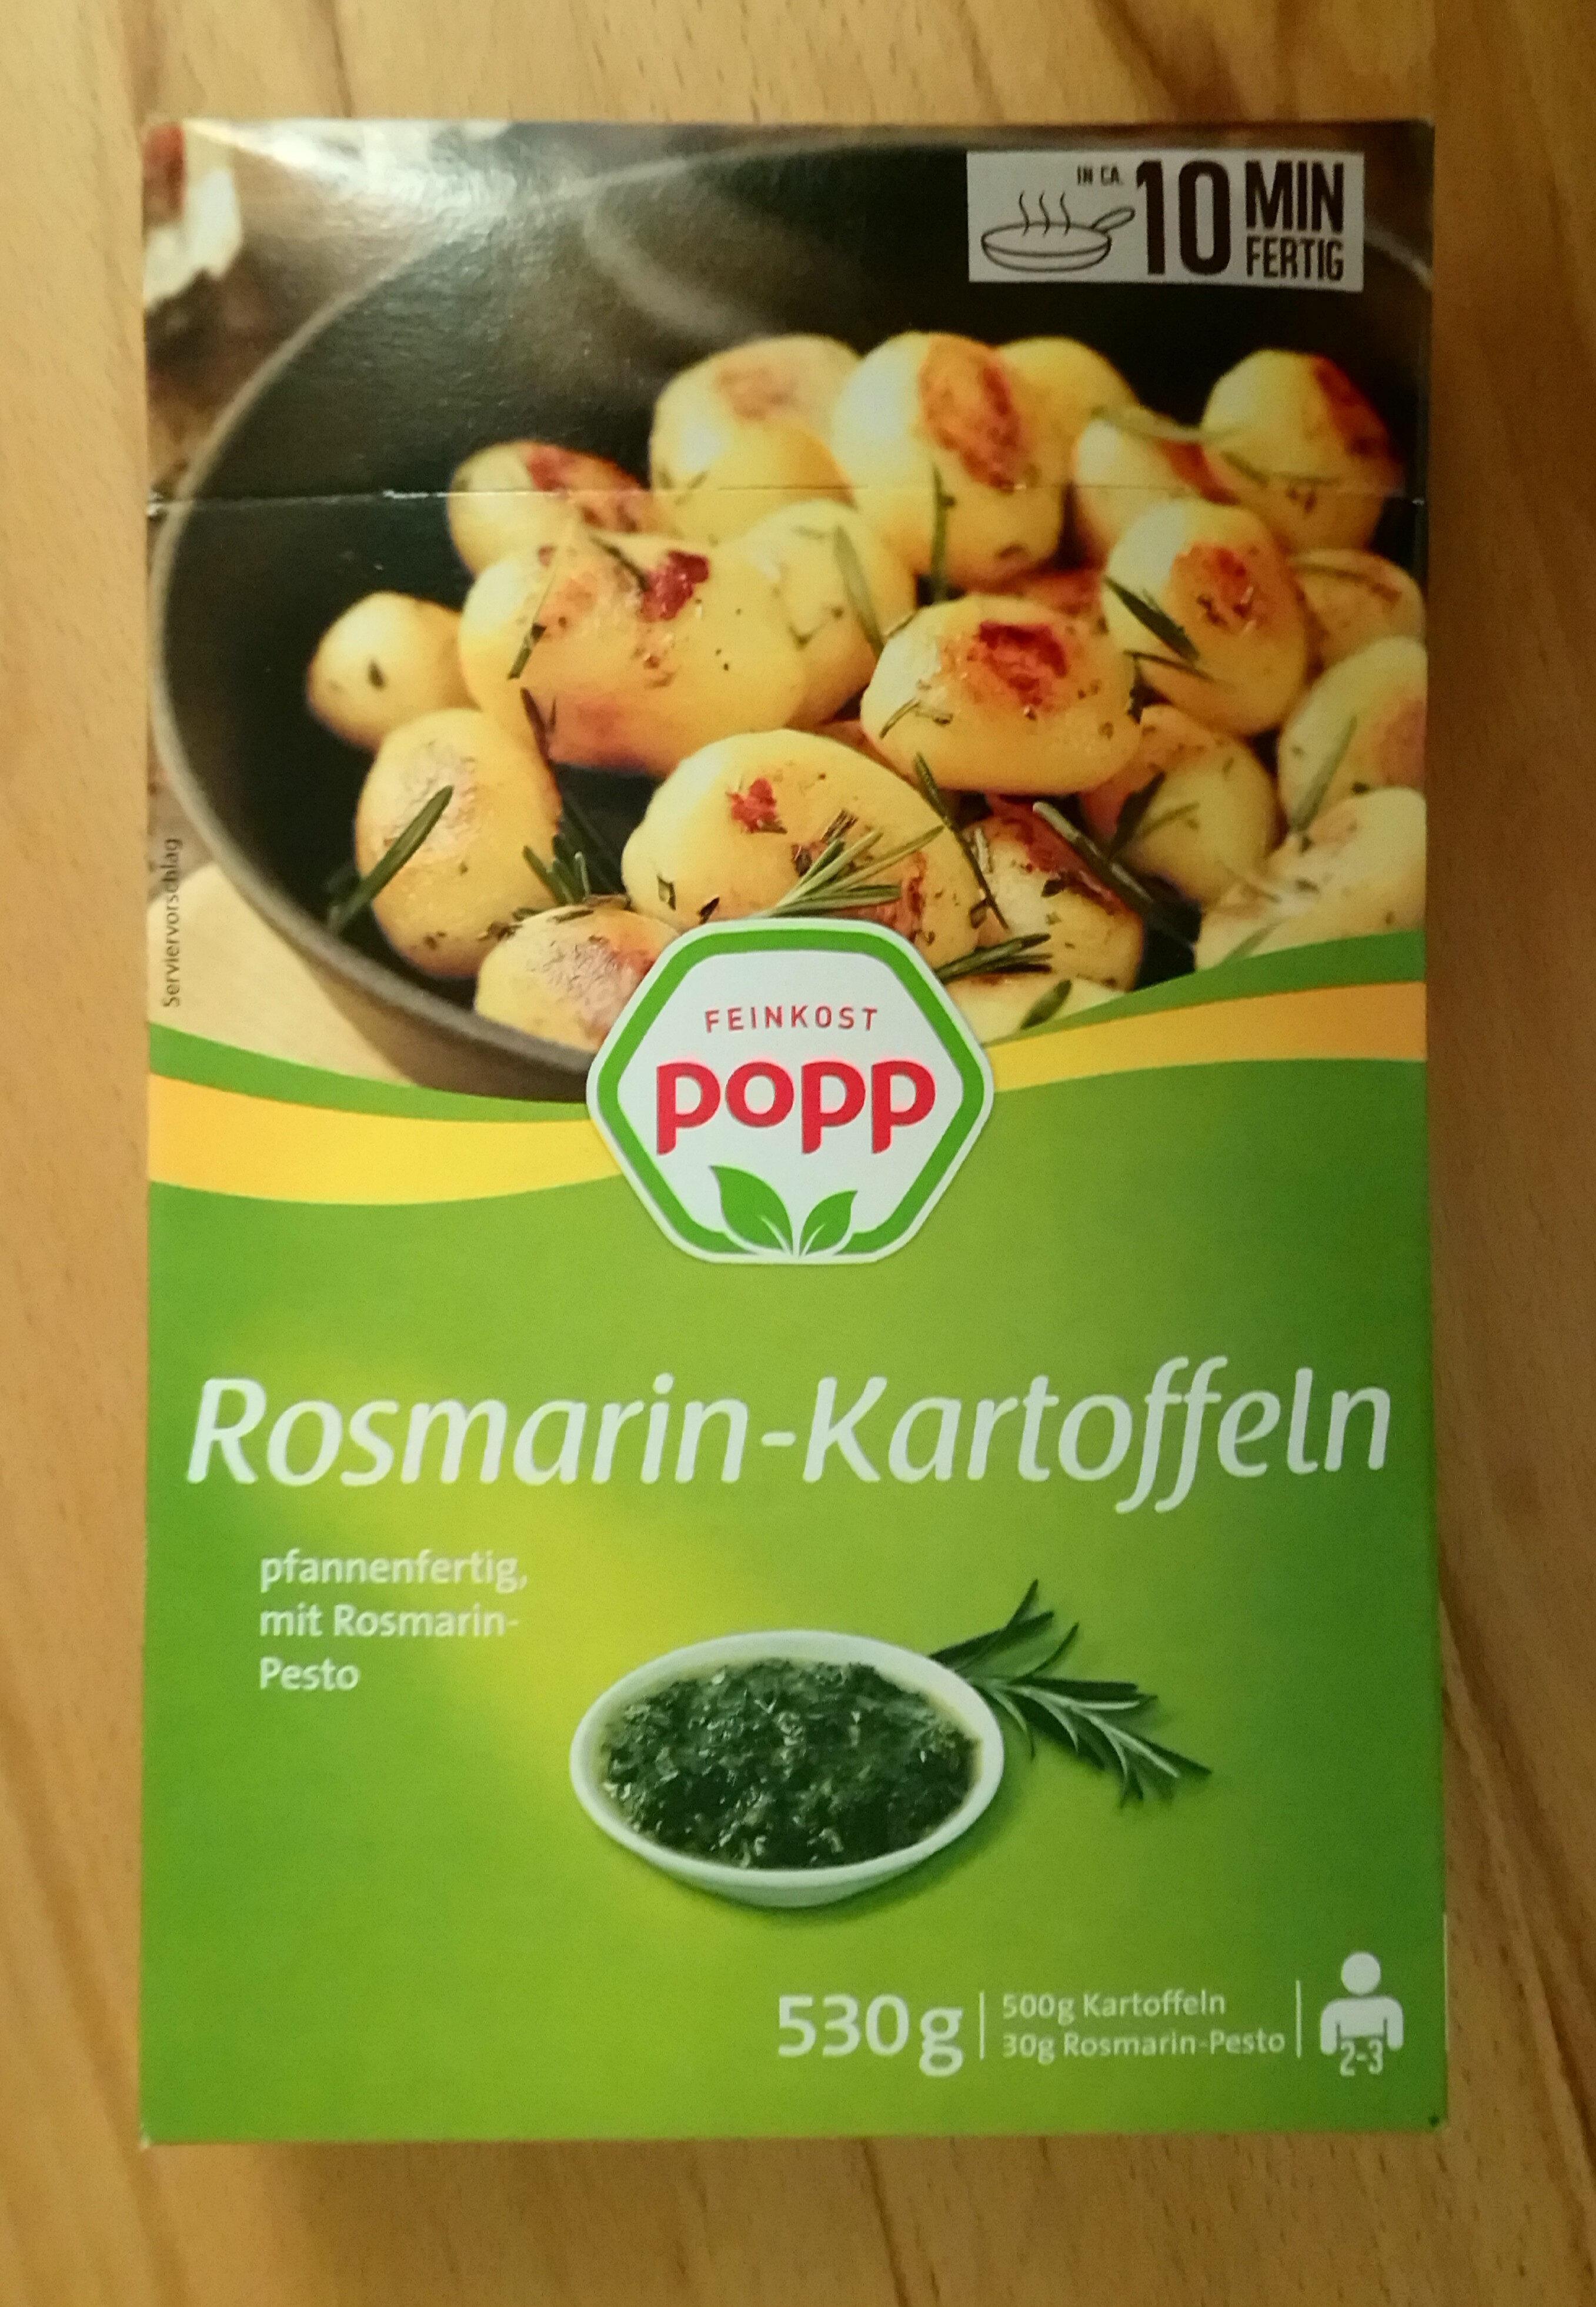 Rosmarin-Kartoffeln - Produit - de